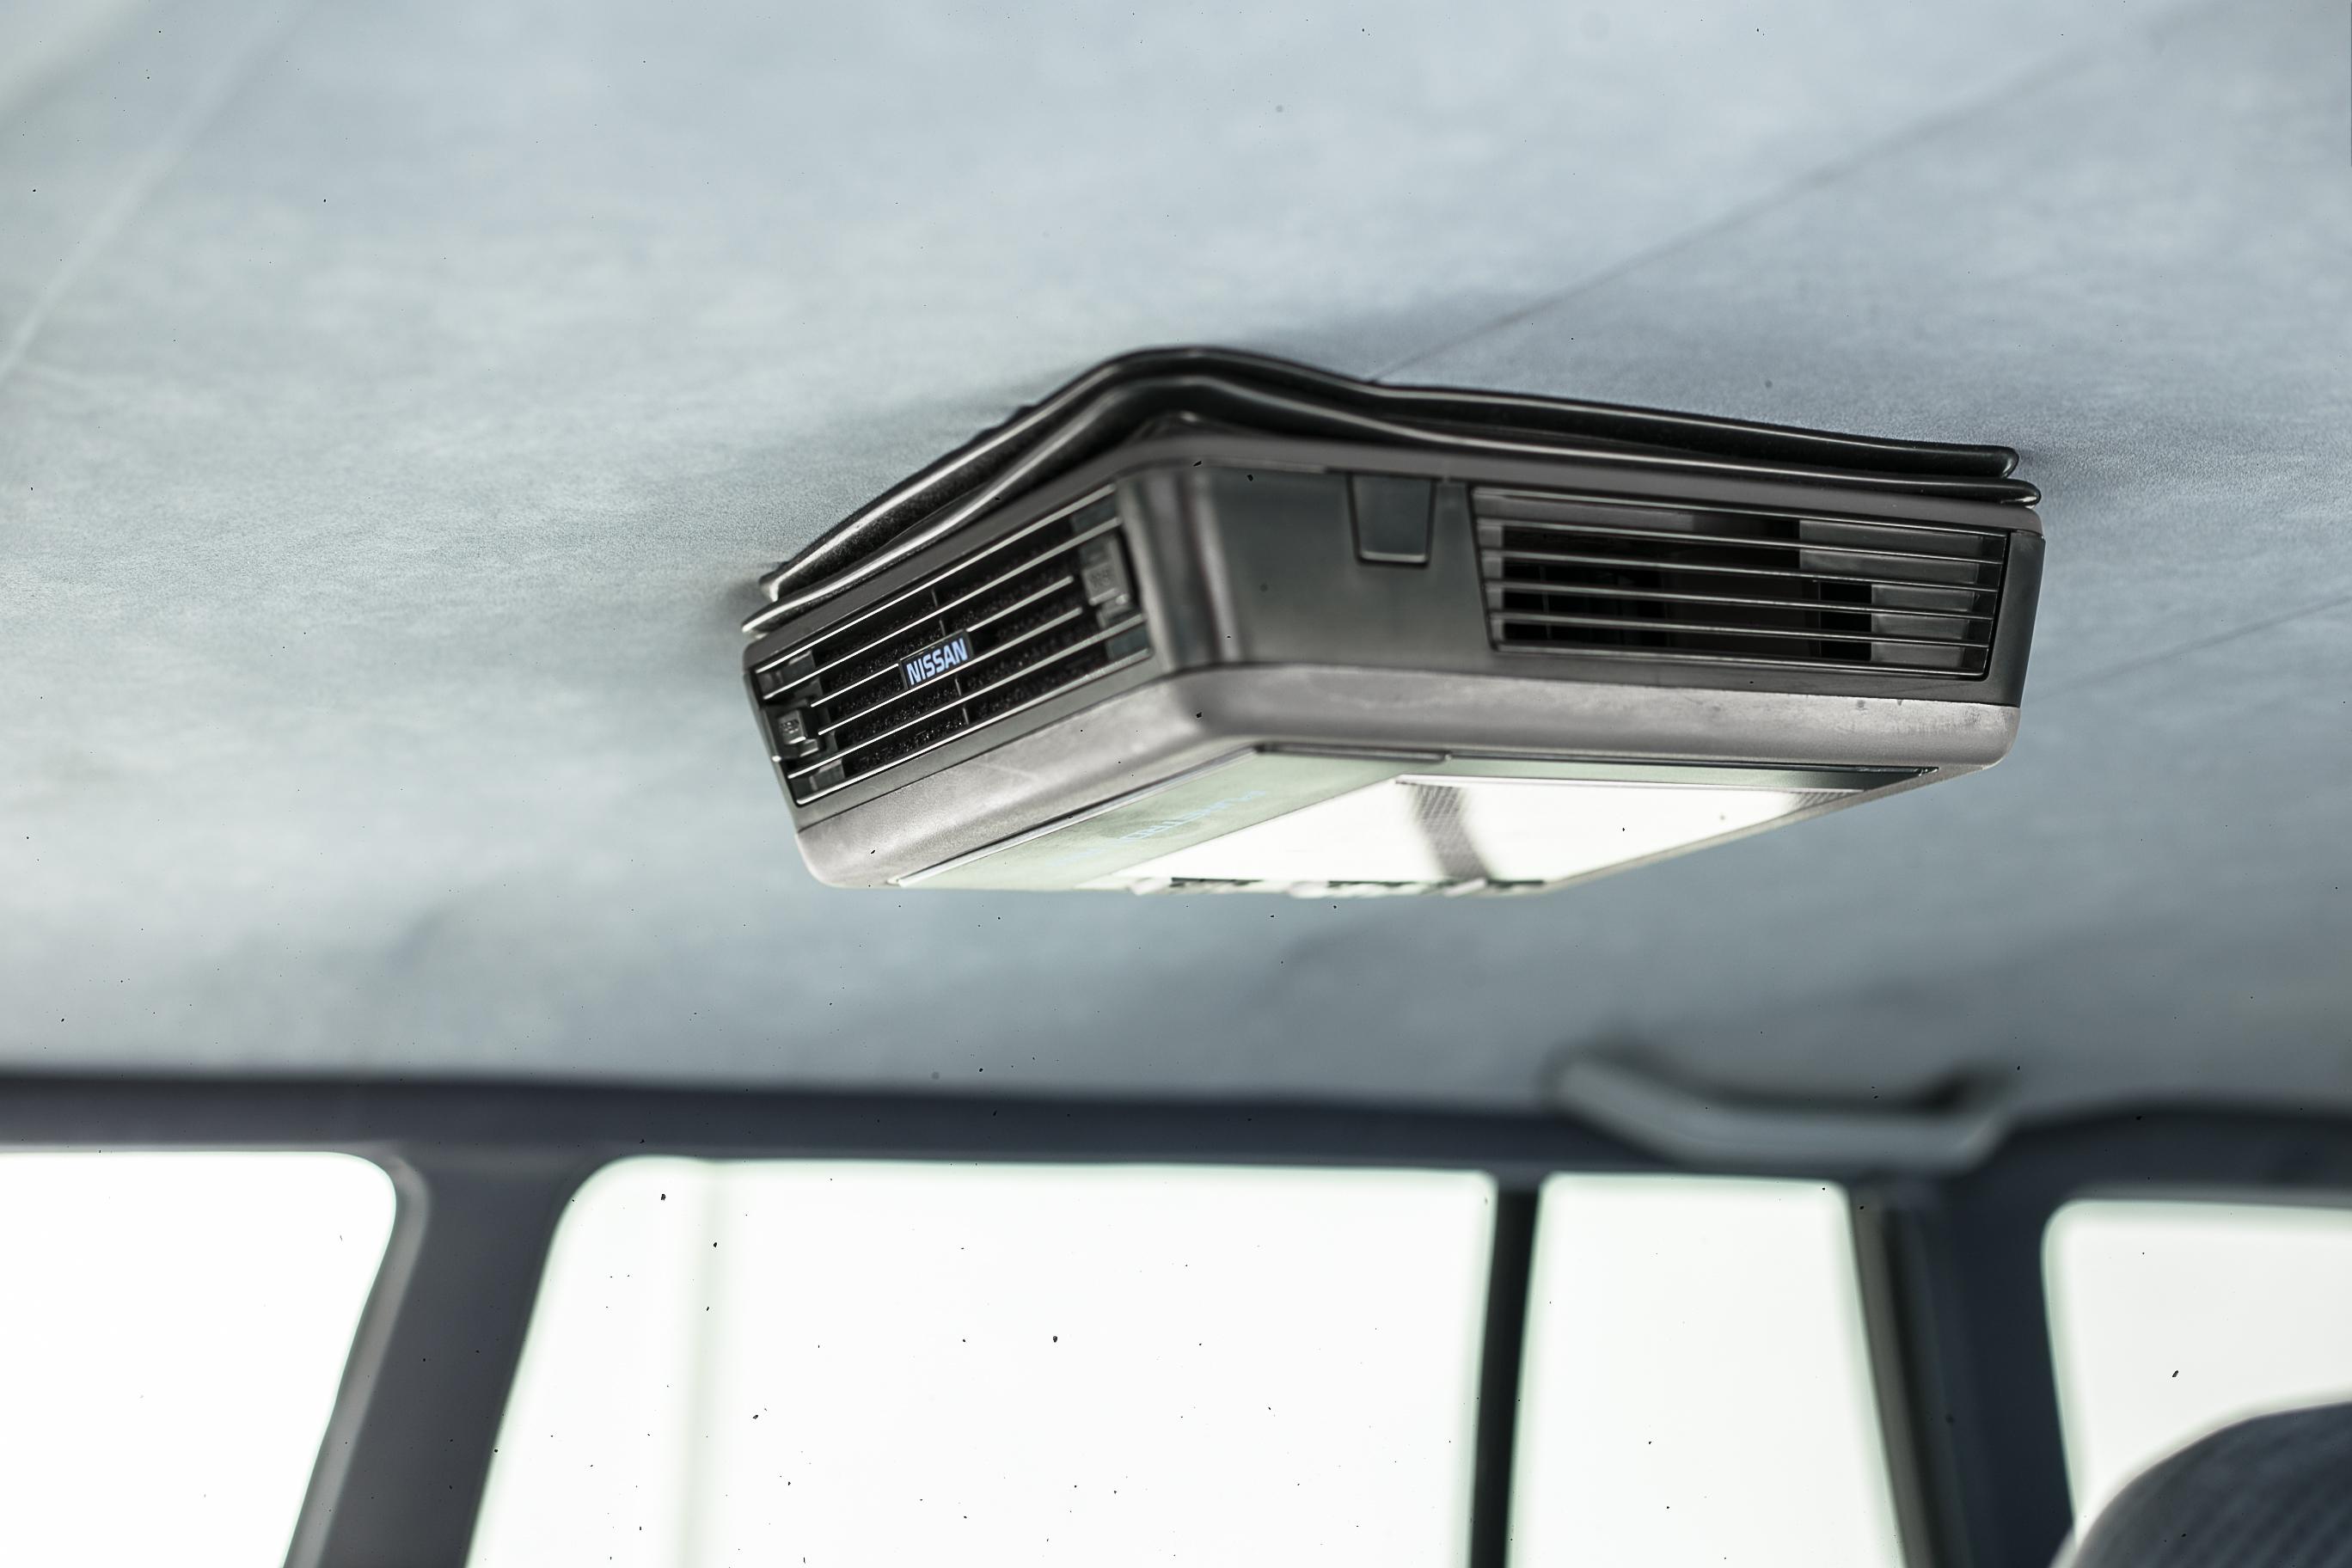 Nissan R31 Skyline turbo wagon ceiling light